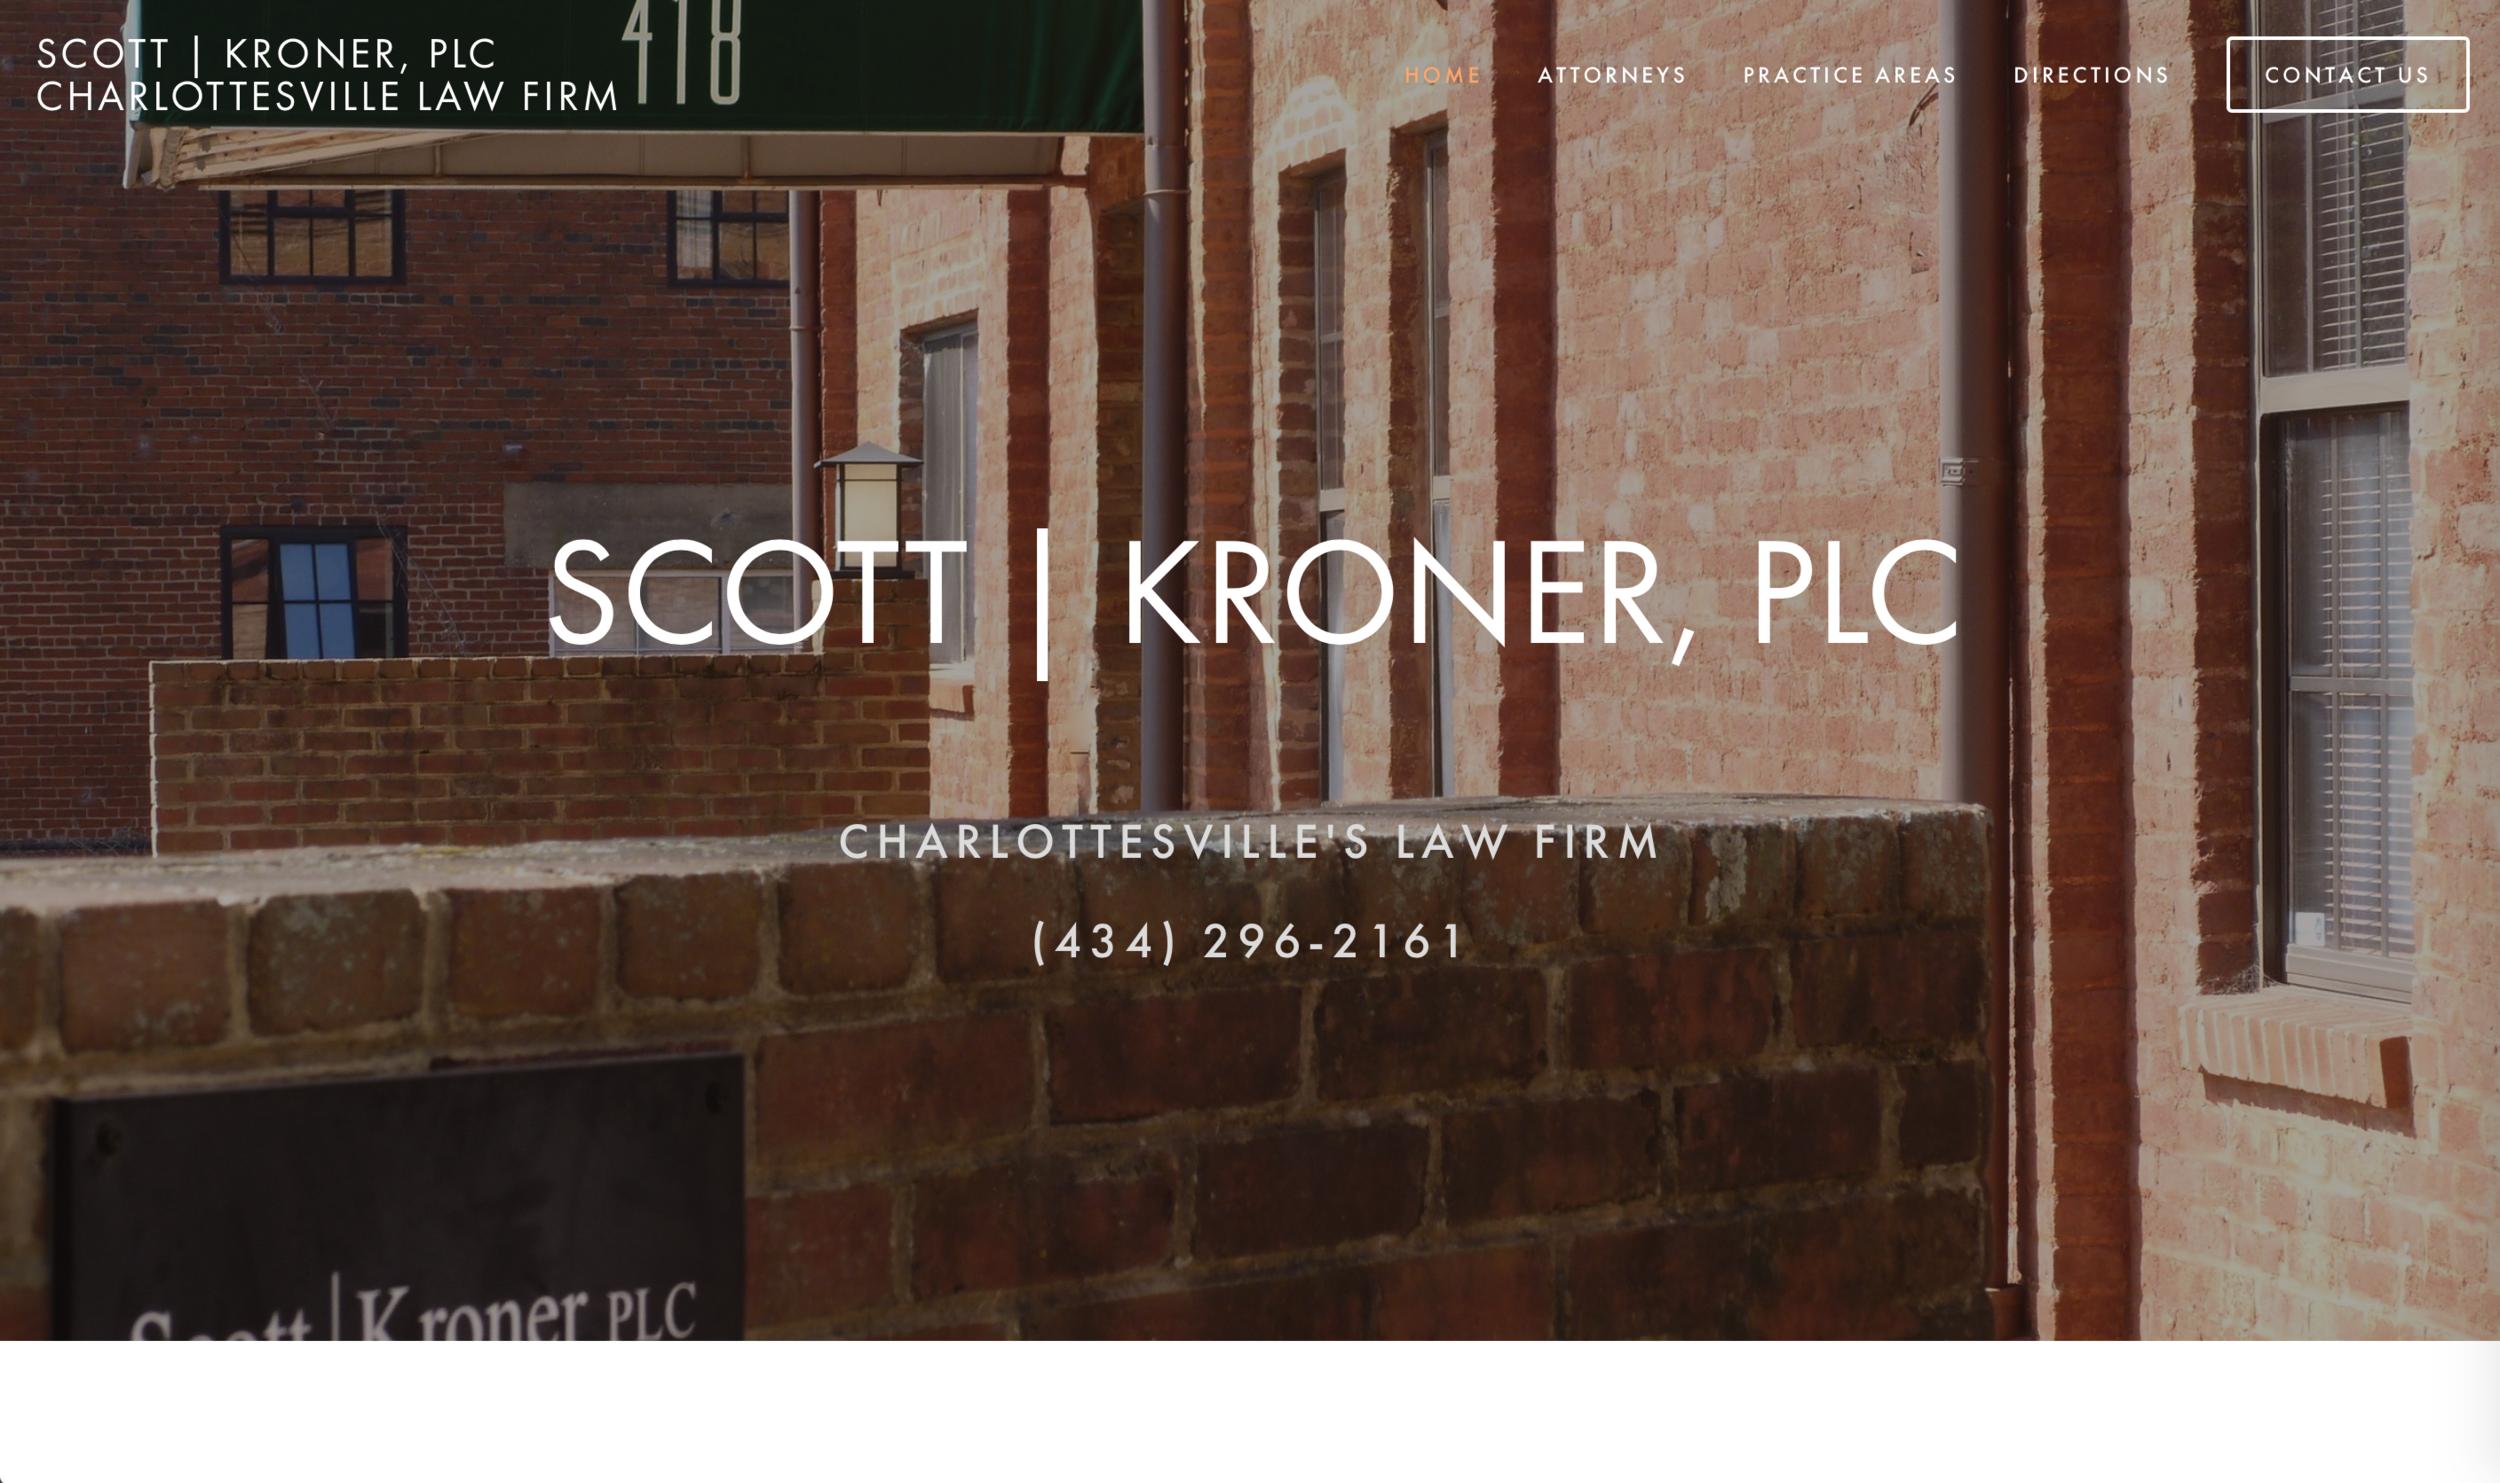 Website Design - Scott Kroner PLC